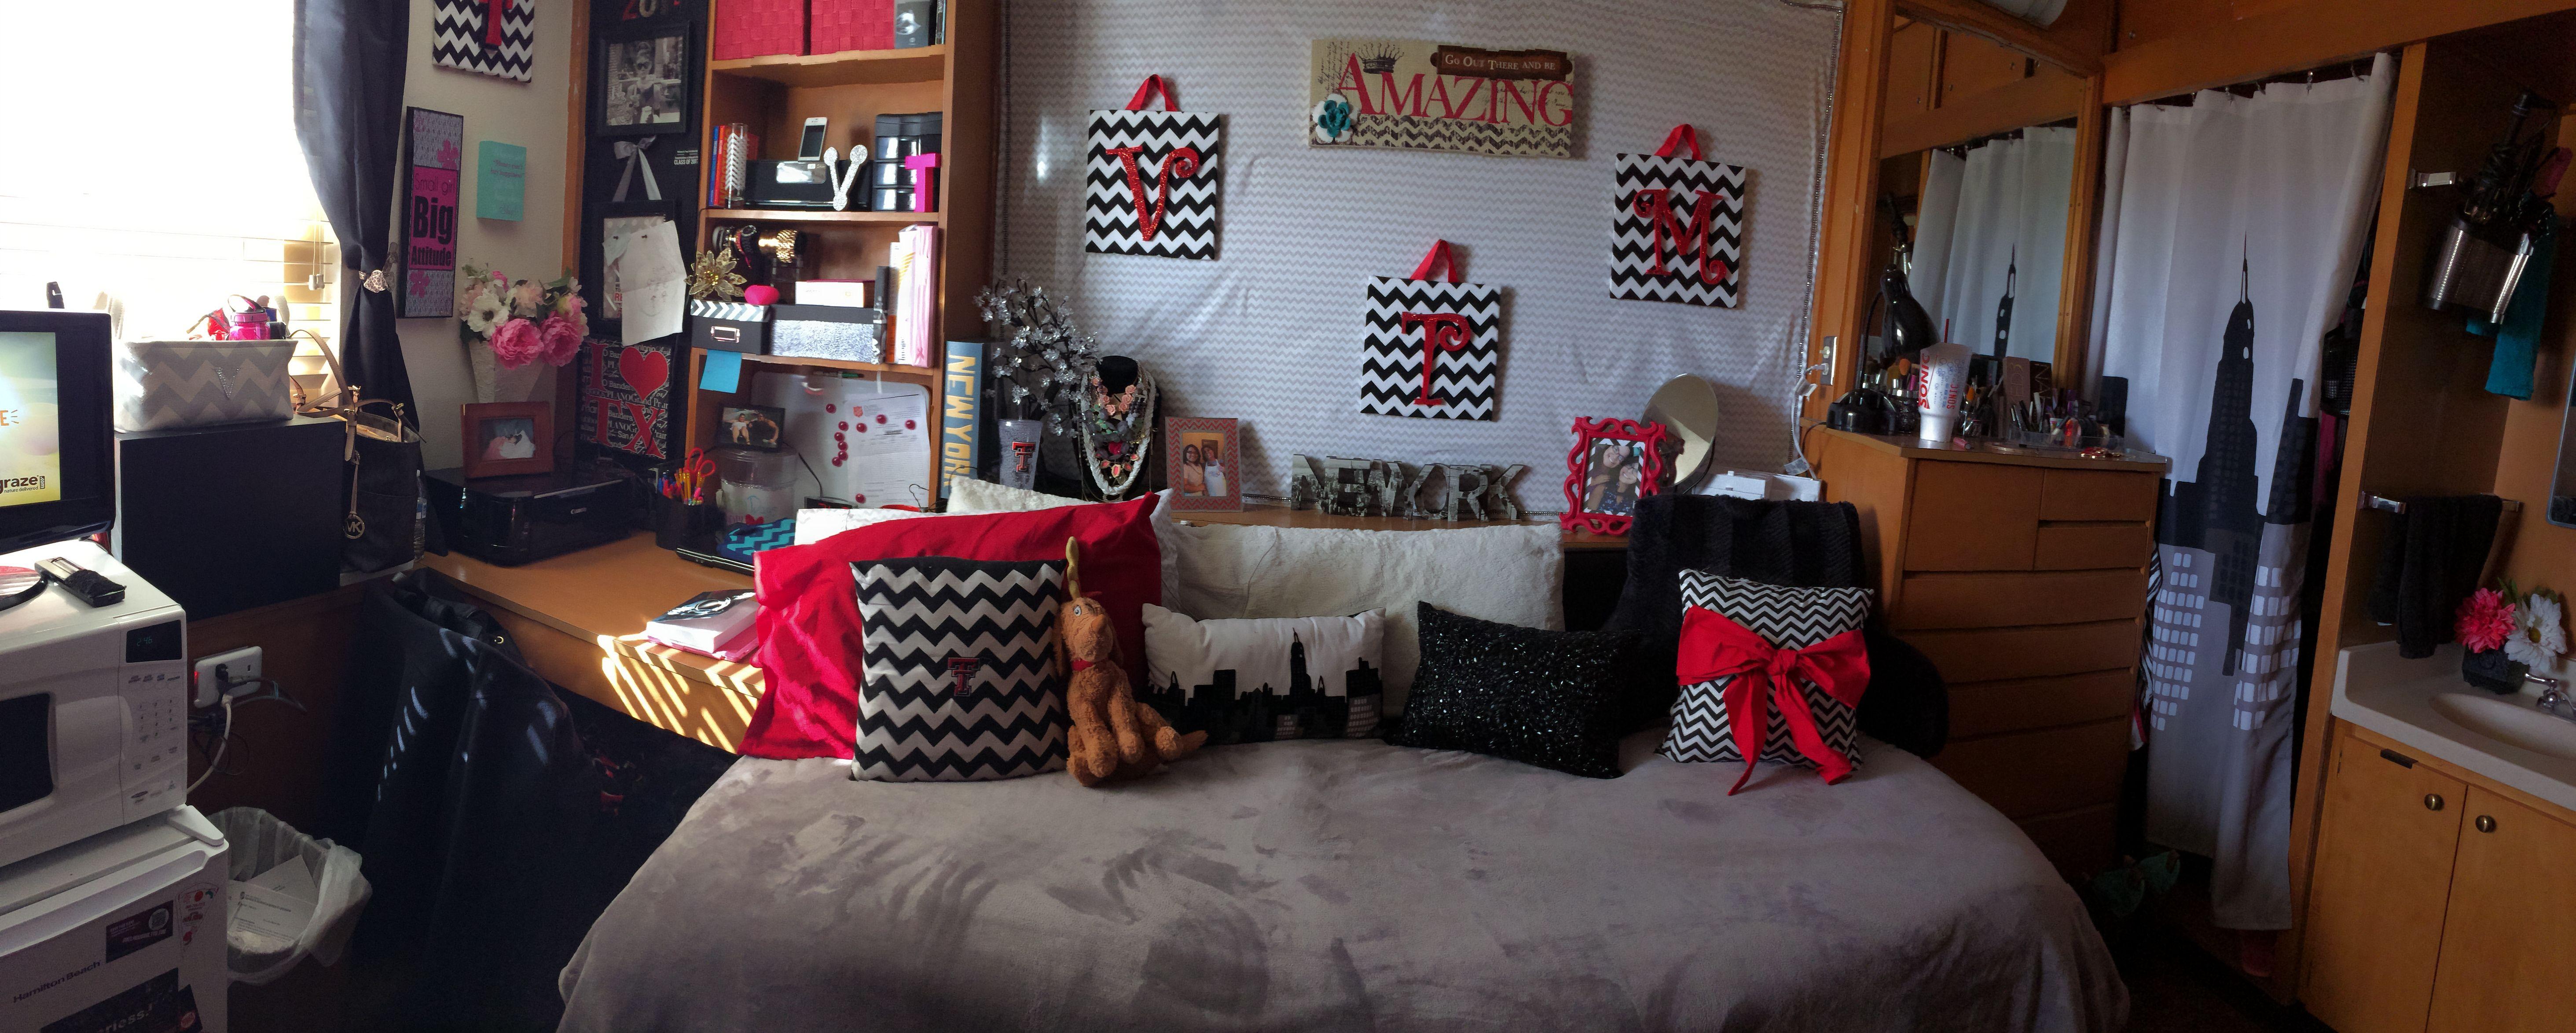 My Dorm Room For Texas Tech Hulen Hall Dorm Room 2nd